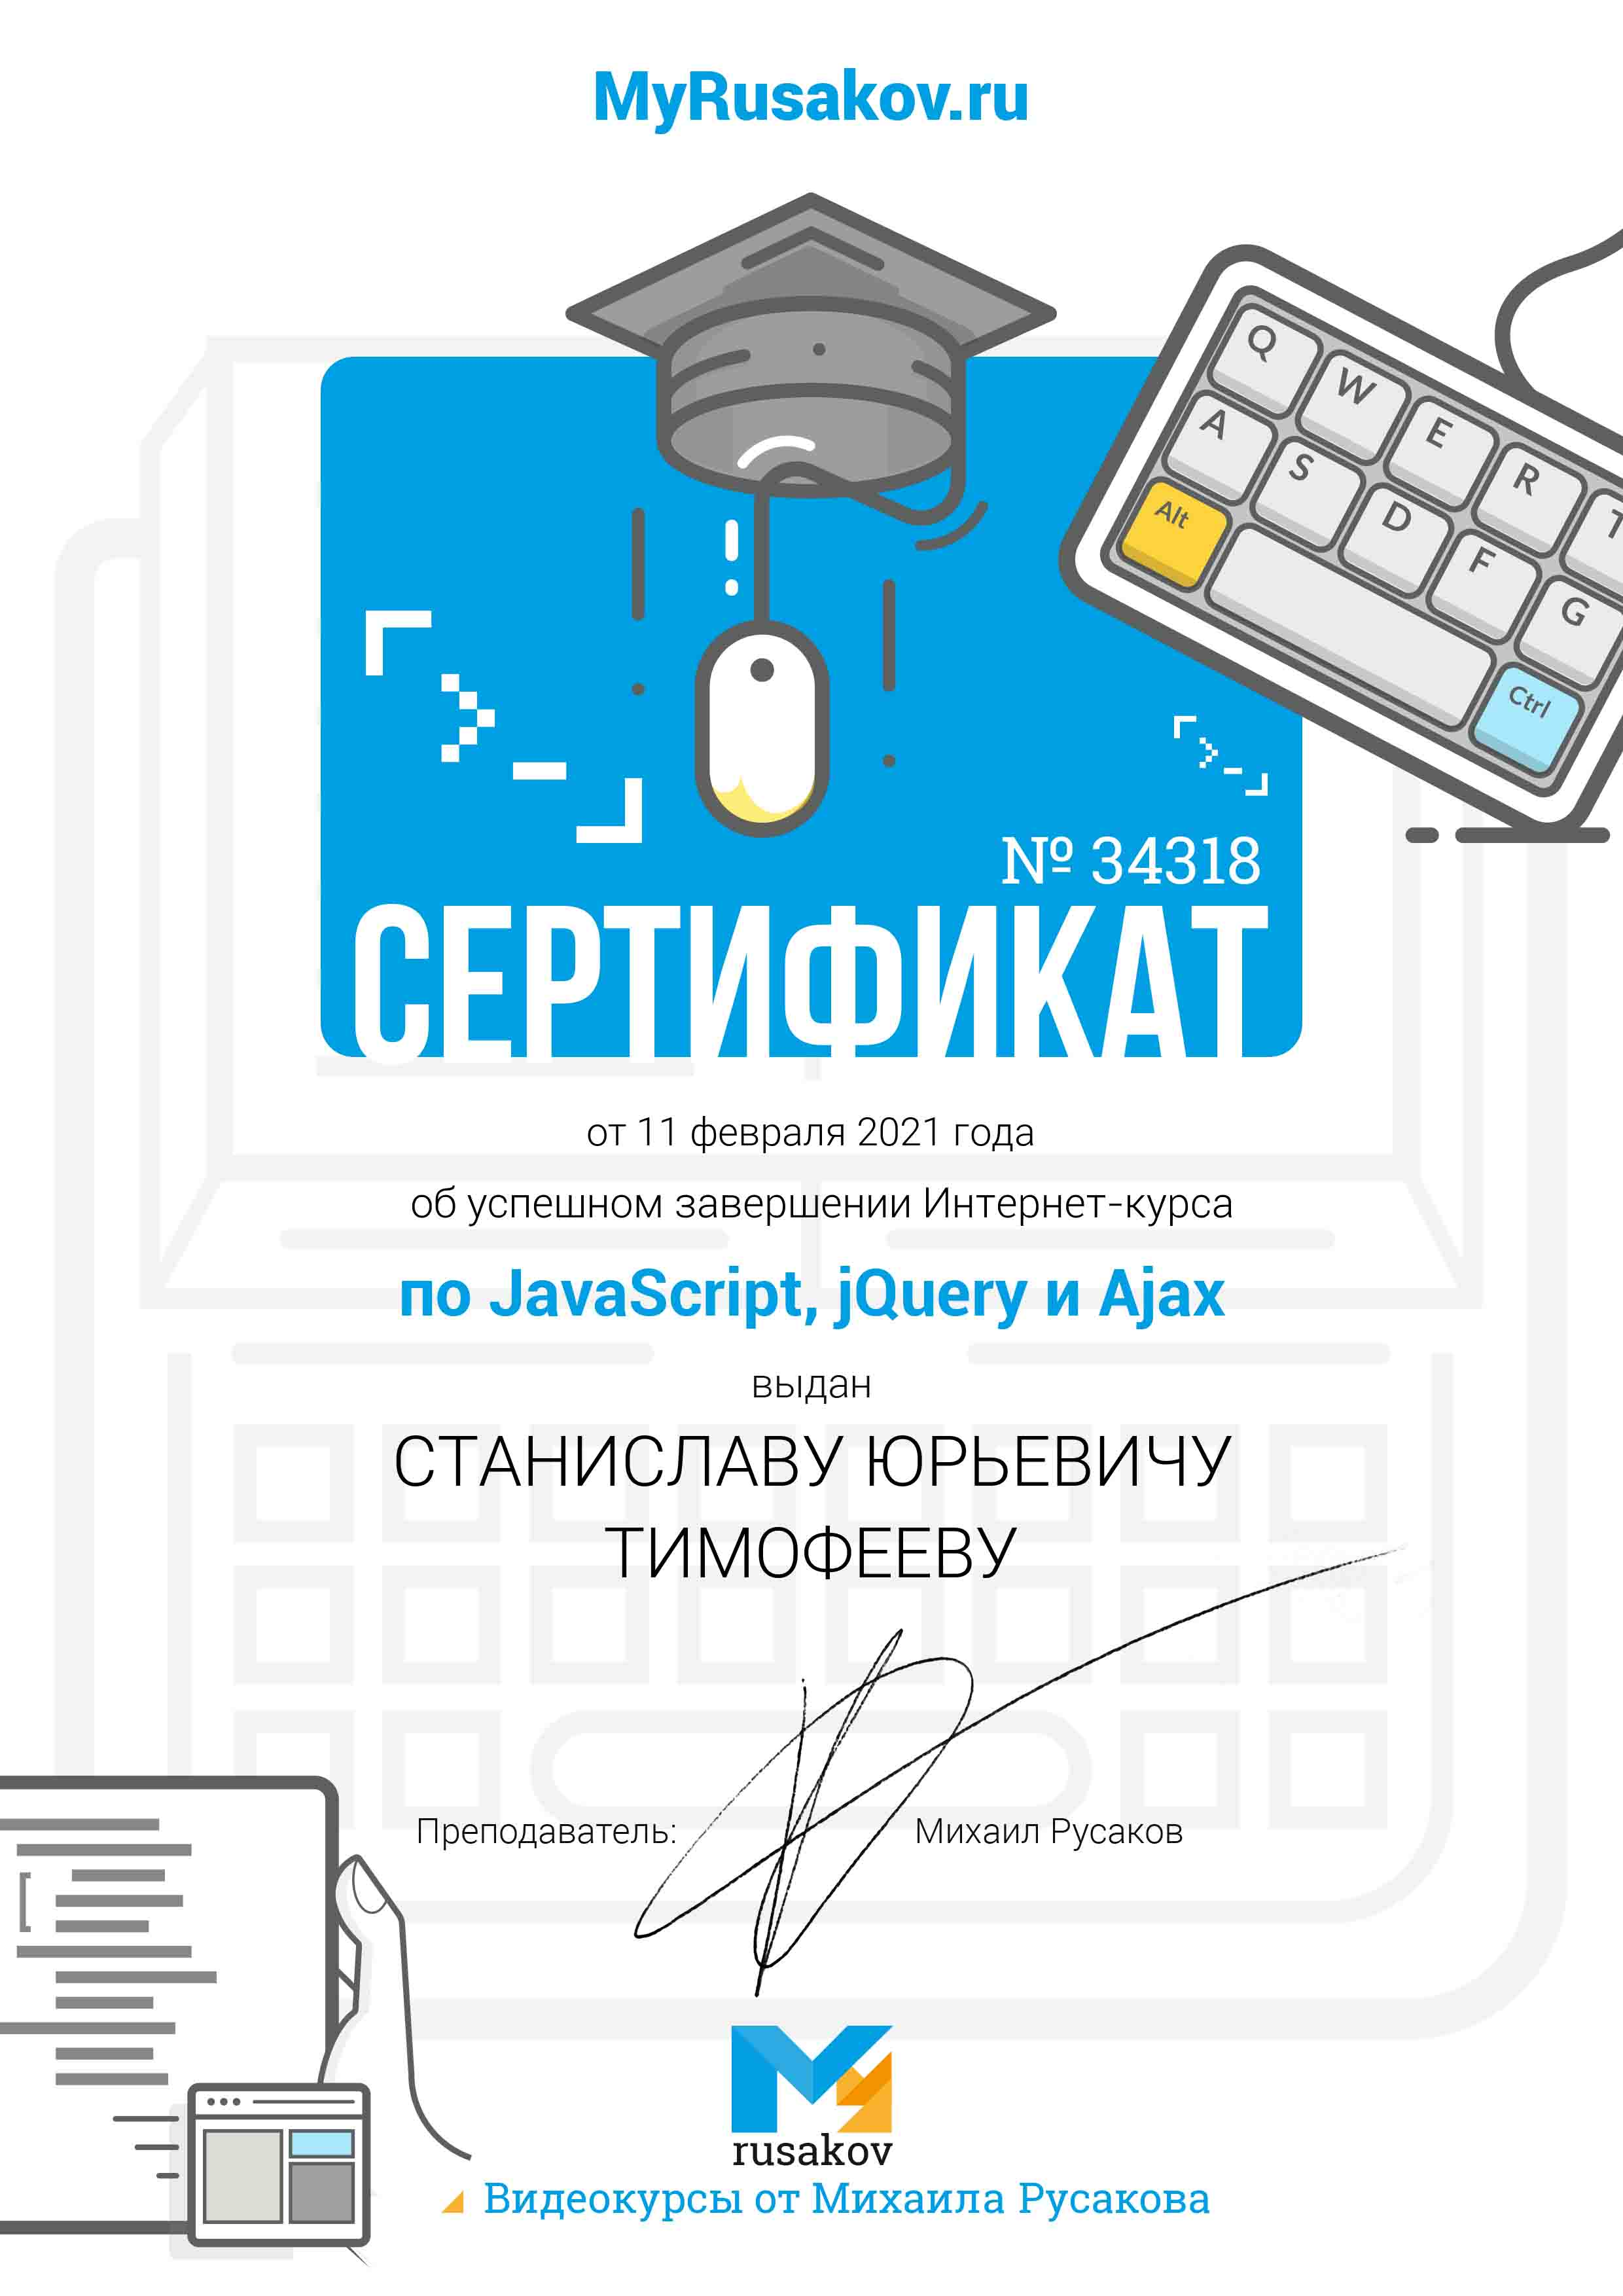 сертификат по JavaScript, jQuery и Ajax